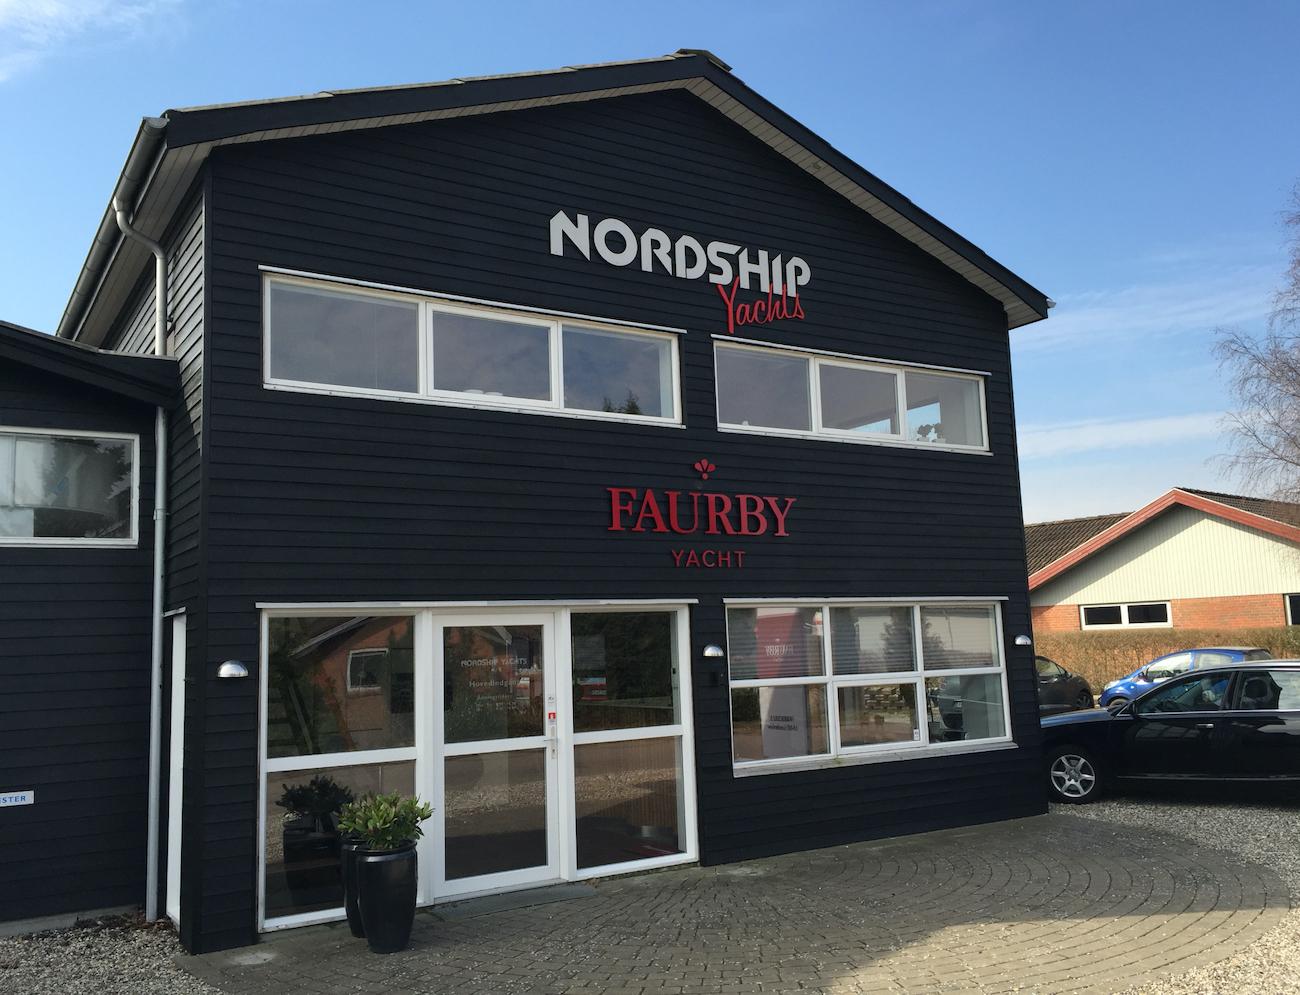 Nordship headoffice